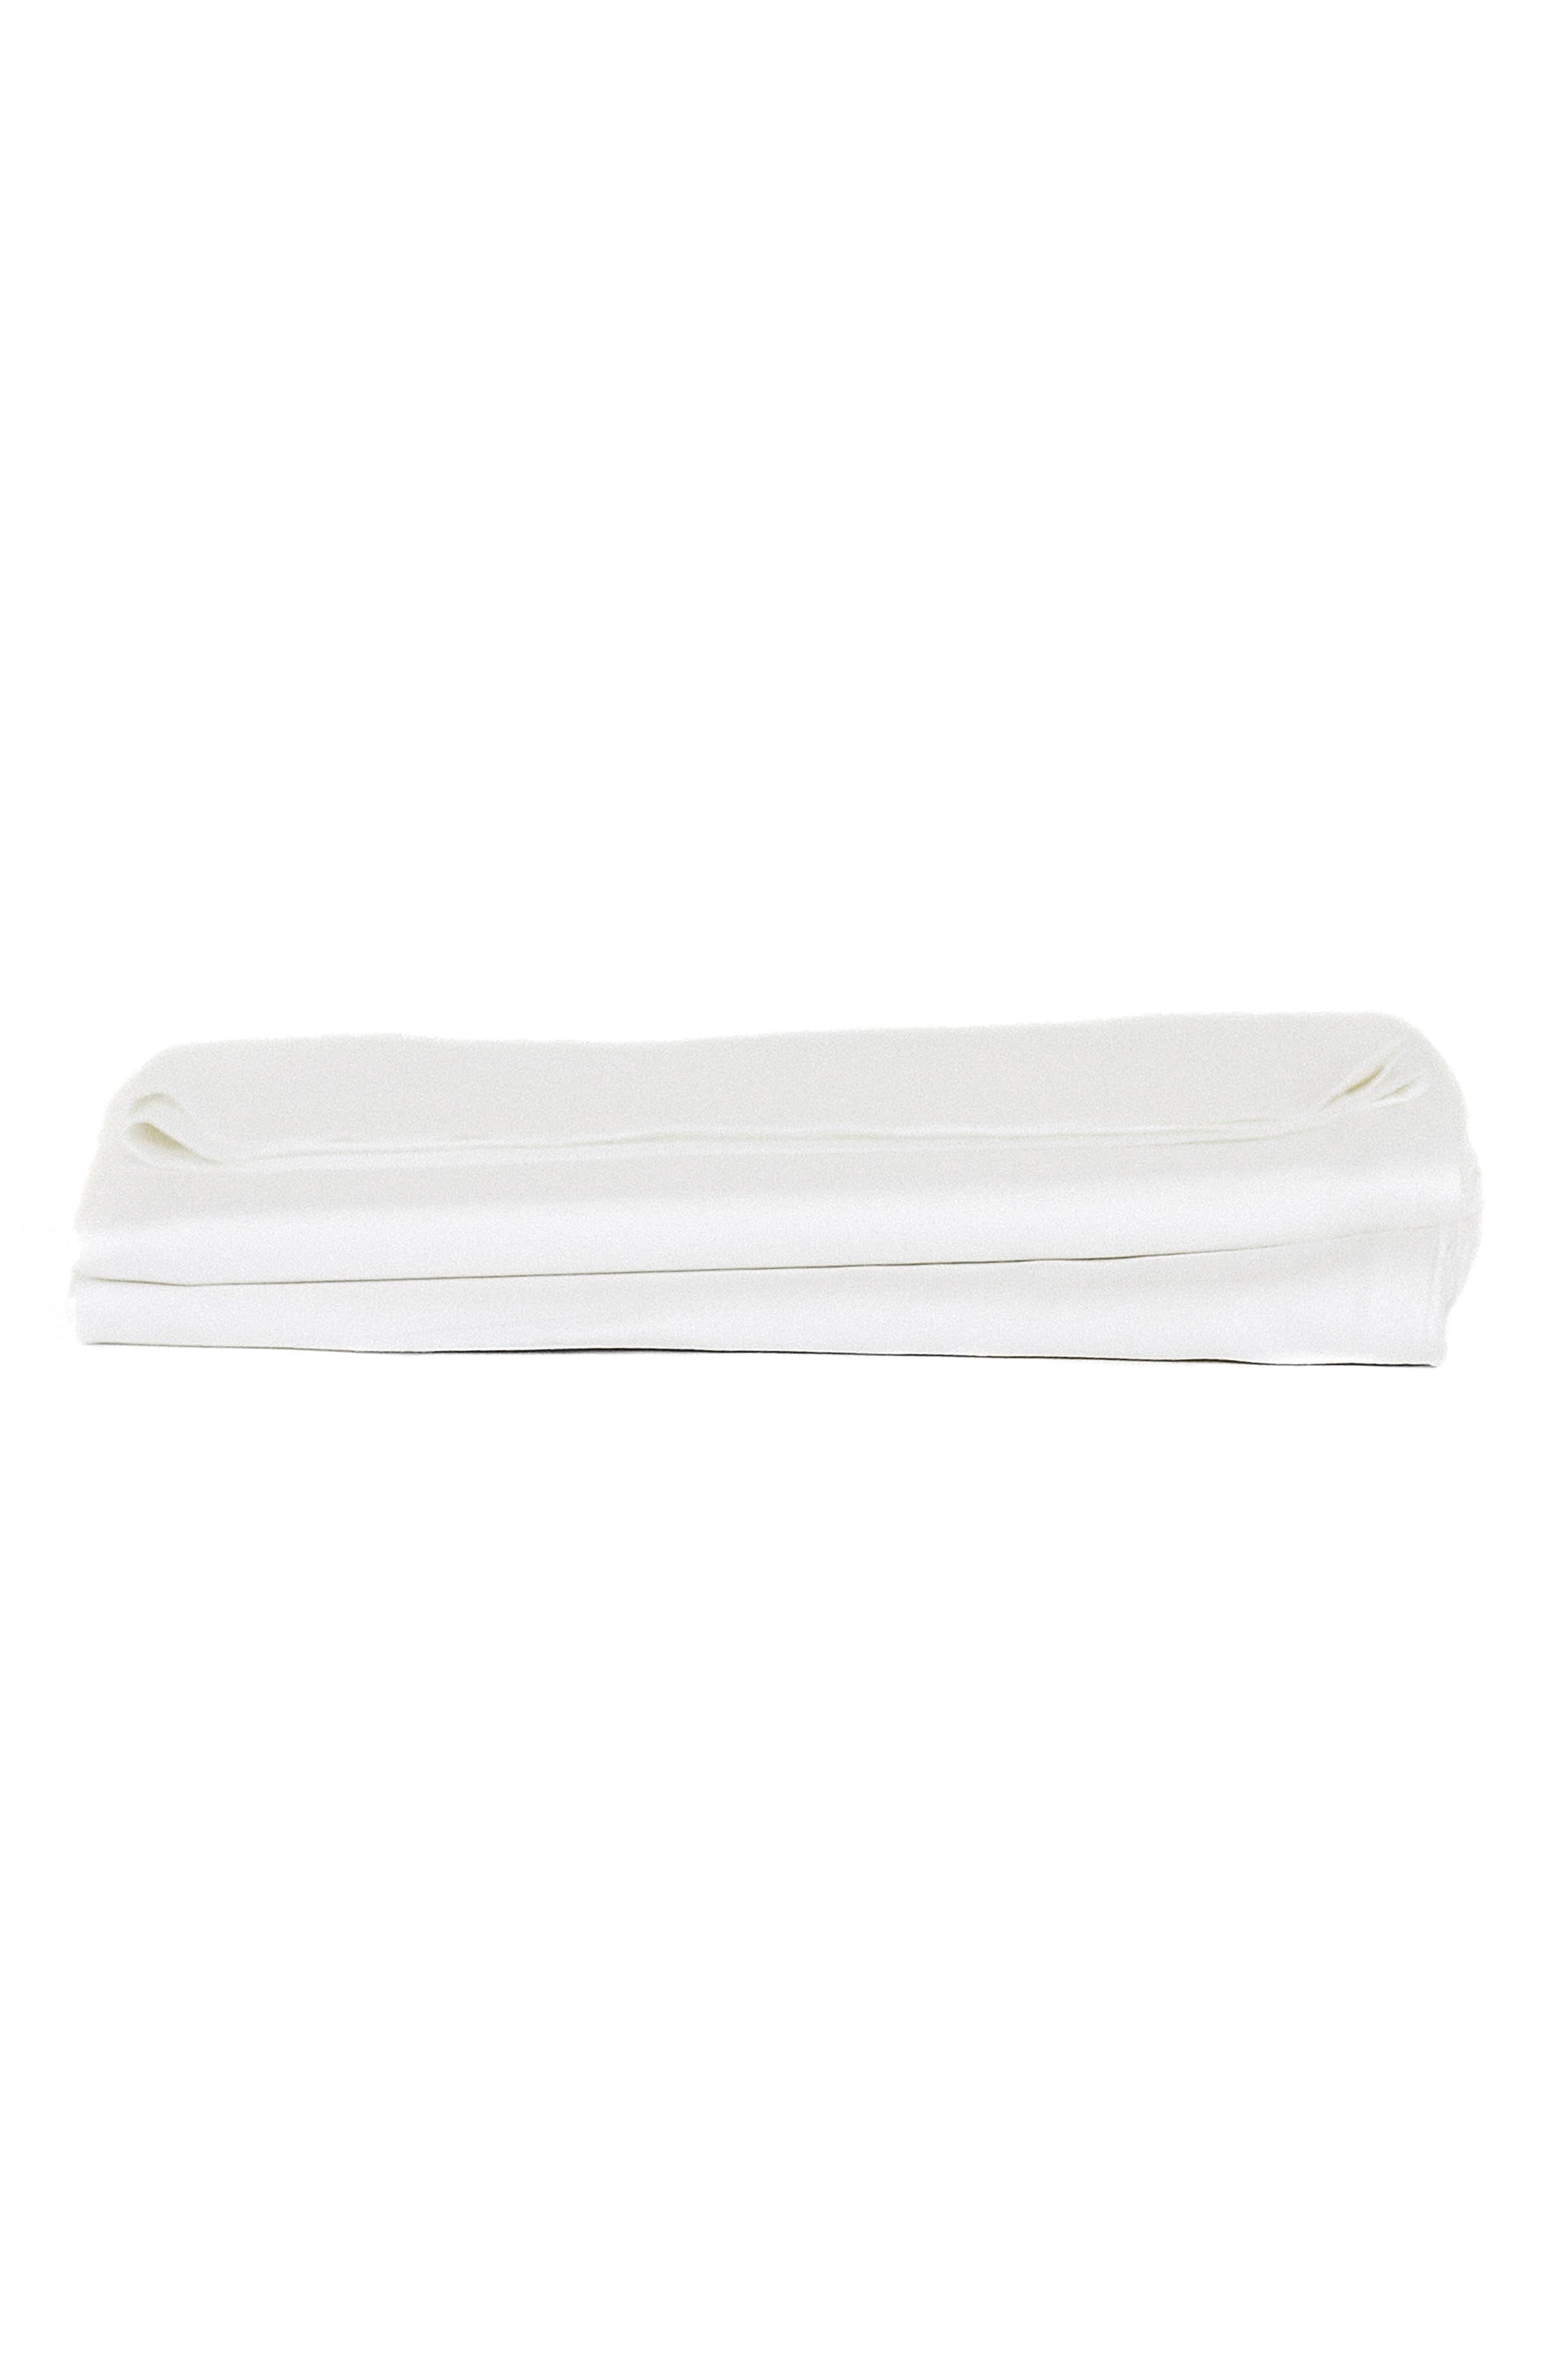 Alternate Image 1 Selected - Cozy Earth Pillowcase